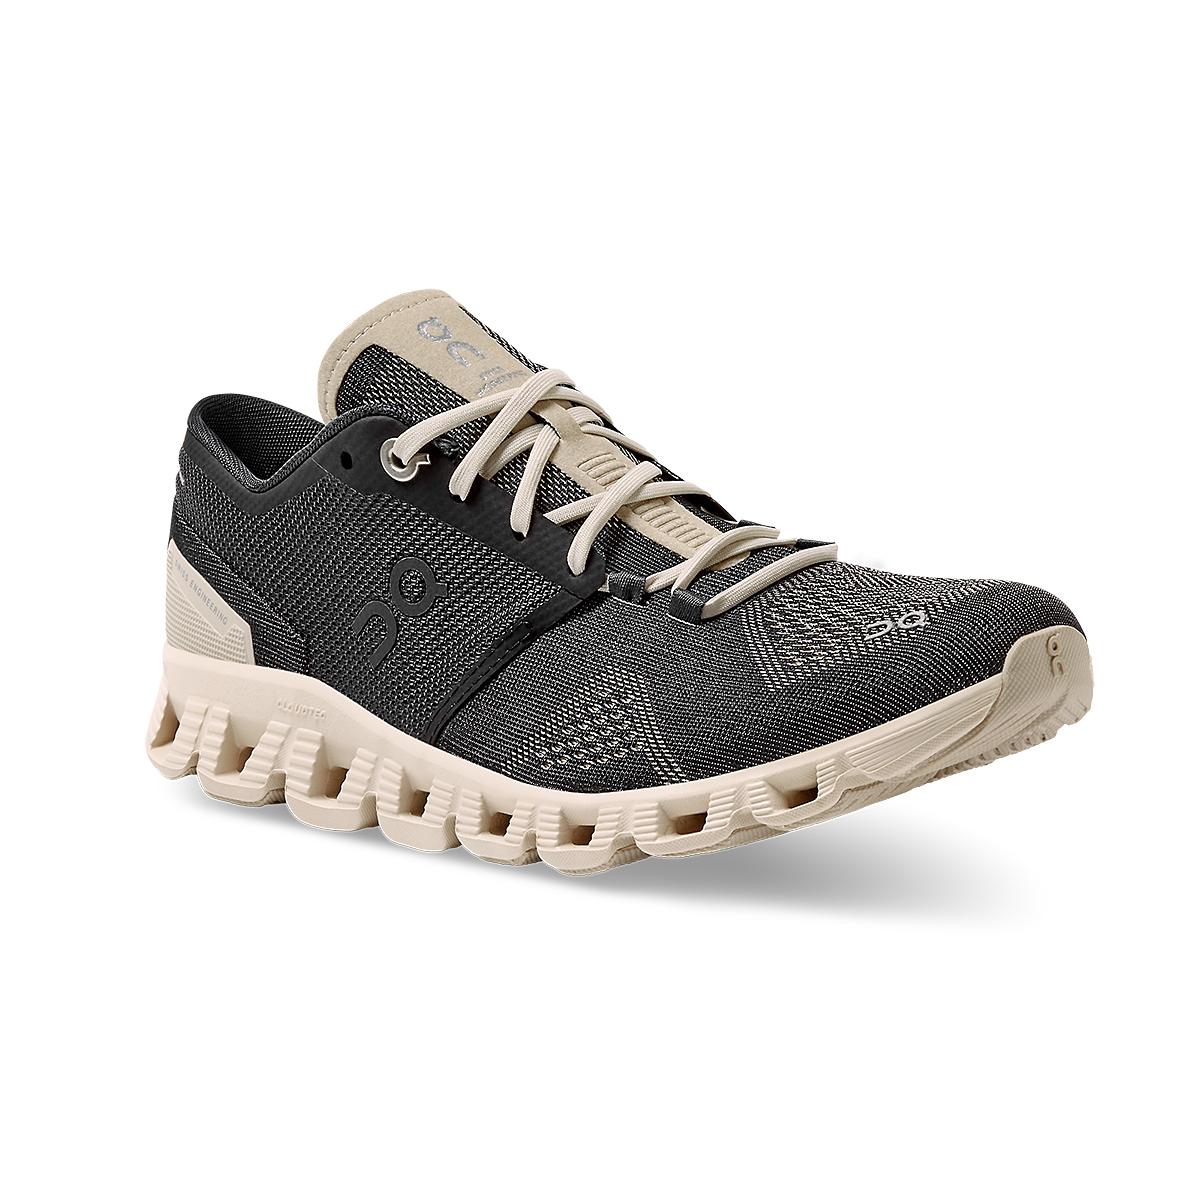 Women's On Cloud X 2.0 Running Shoe - Color: Black/Pearl - Size: 5 - Width: Regular, Black/Pearl, large, image 2